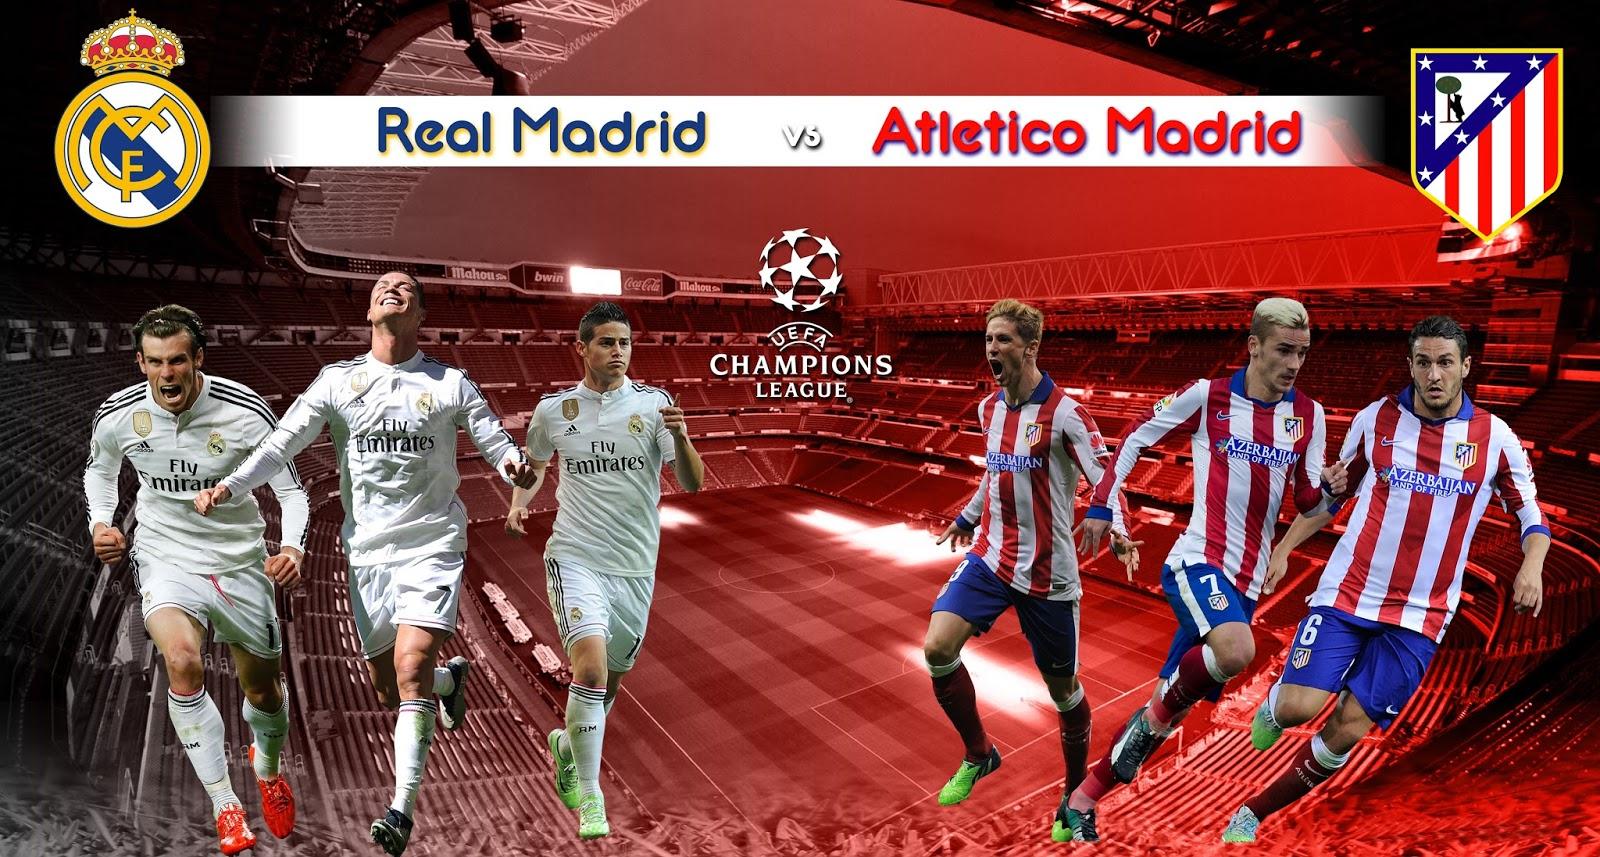 PREDIKSI LAGA REAL MADRID VS ATLETICO MADRID : LOS BLANCOS Di Atas Angin!